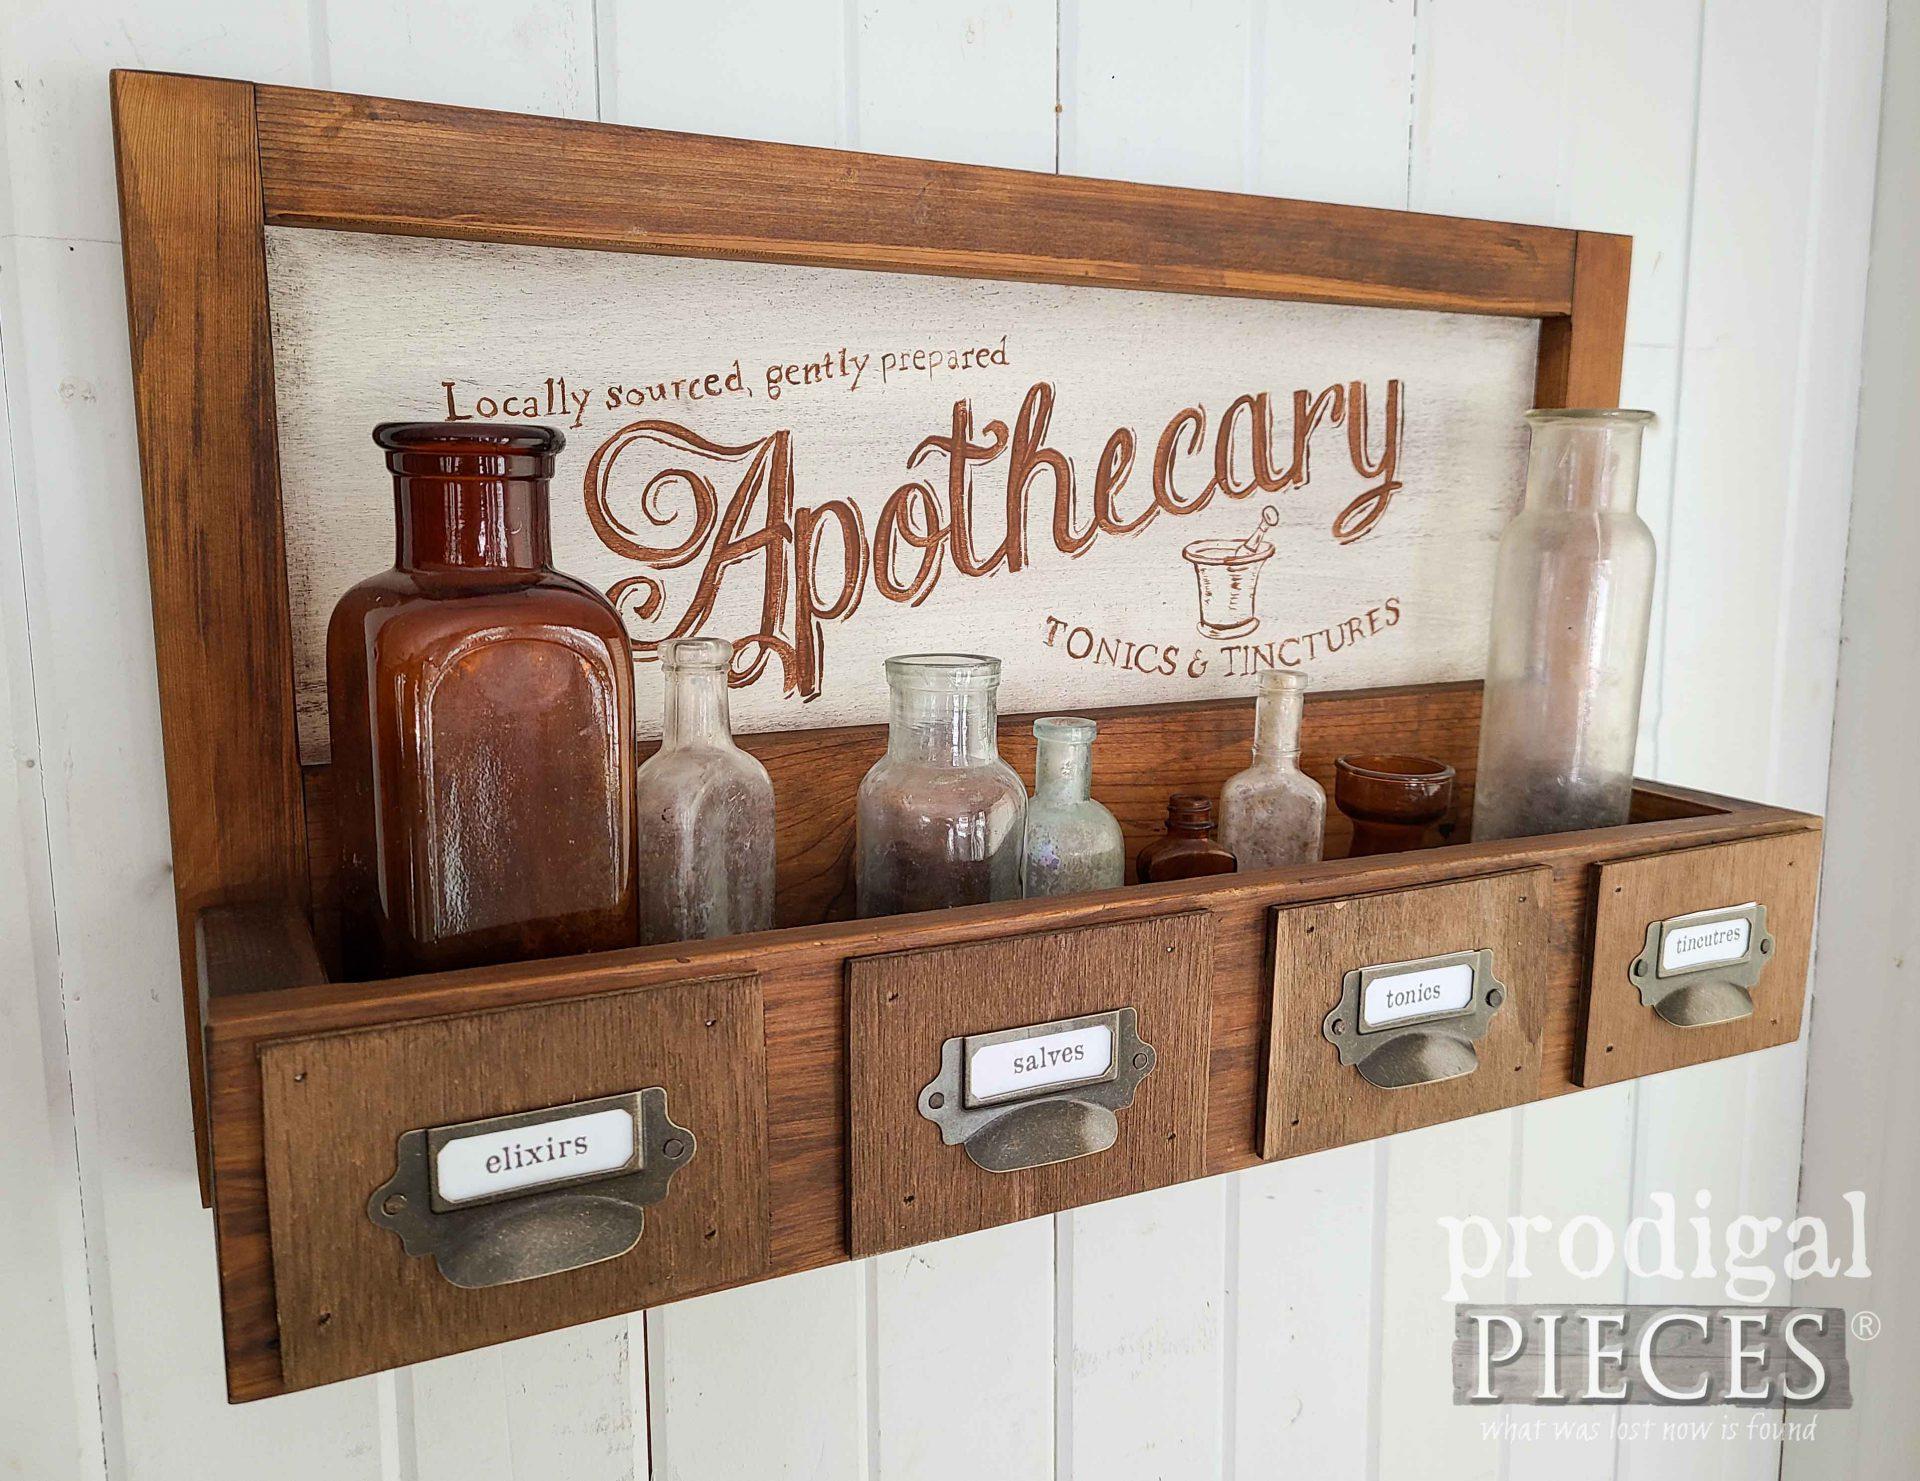 Handmade Apothecary Style Shelf by Larissa of Prodigal Pieces | prodigalpieces.com #prodigalpieces #handmade #farmhouse #home #homedecor